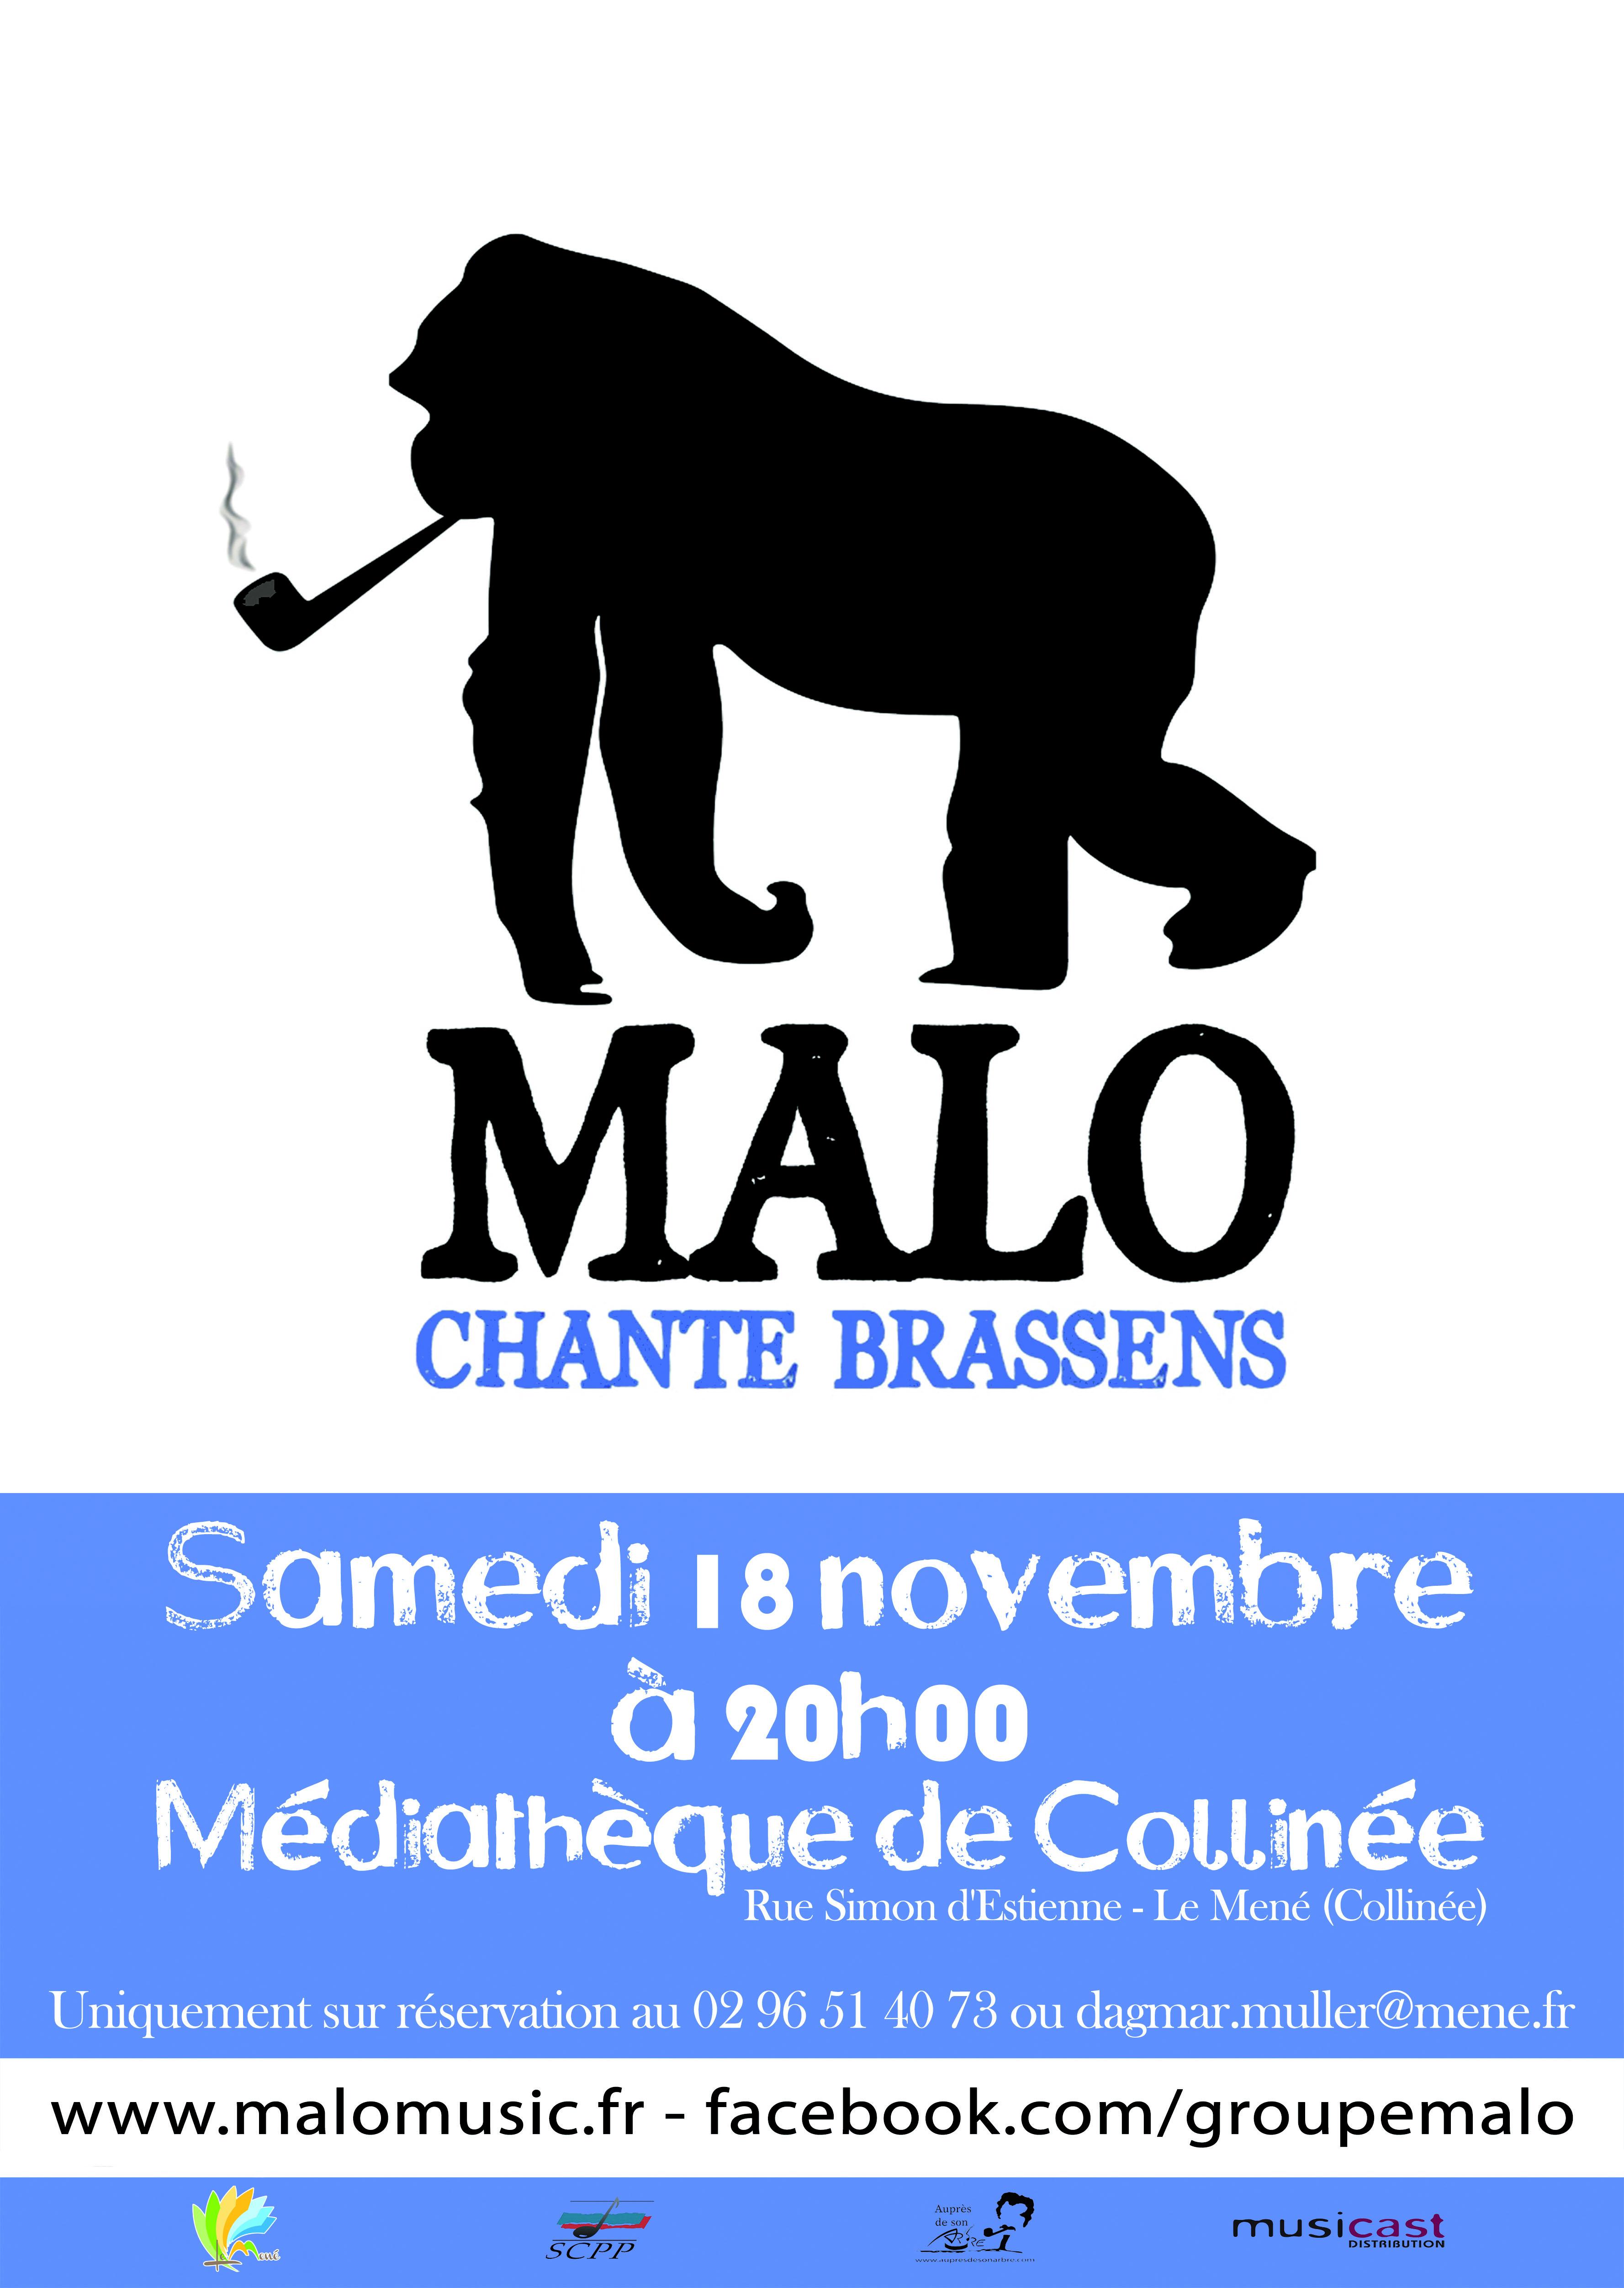 Affiche Malo chante Brassens copie